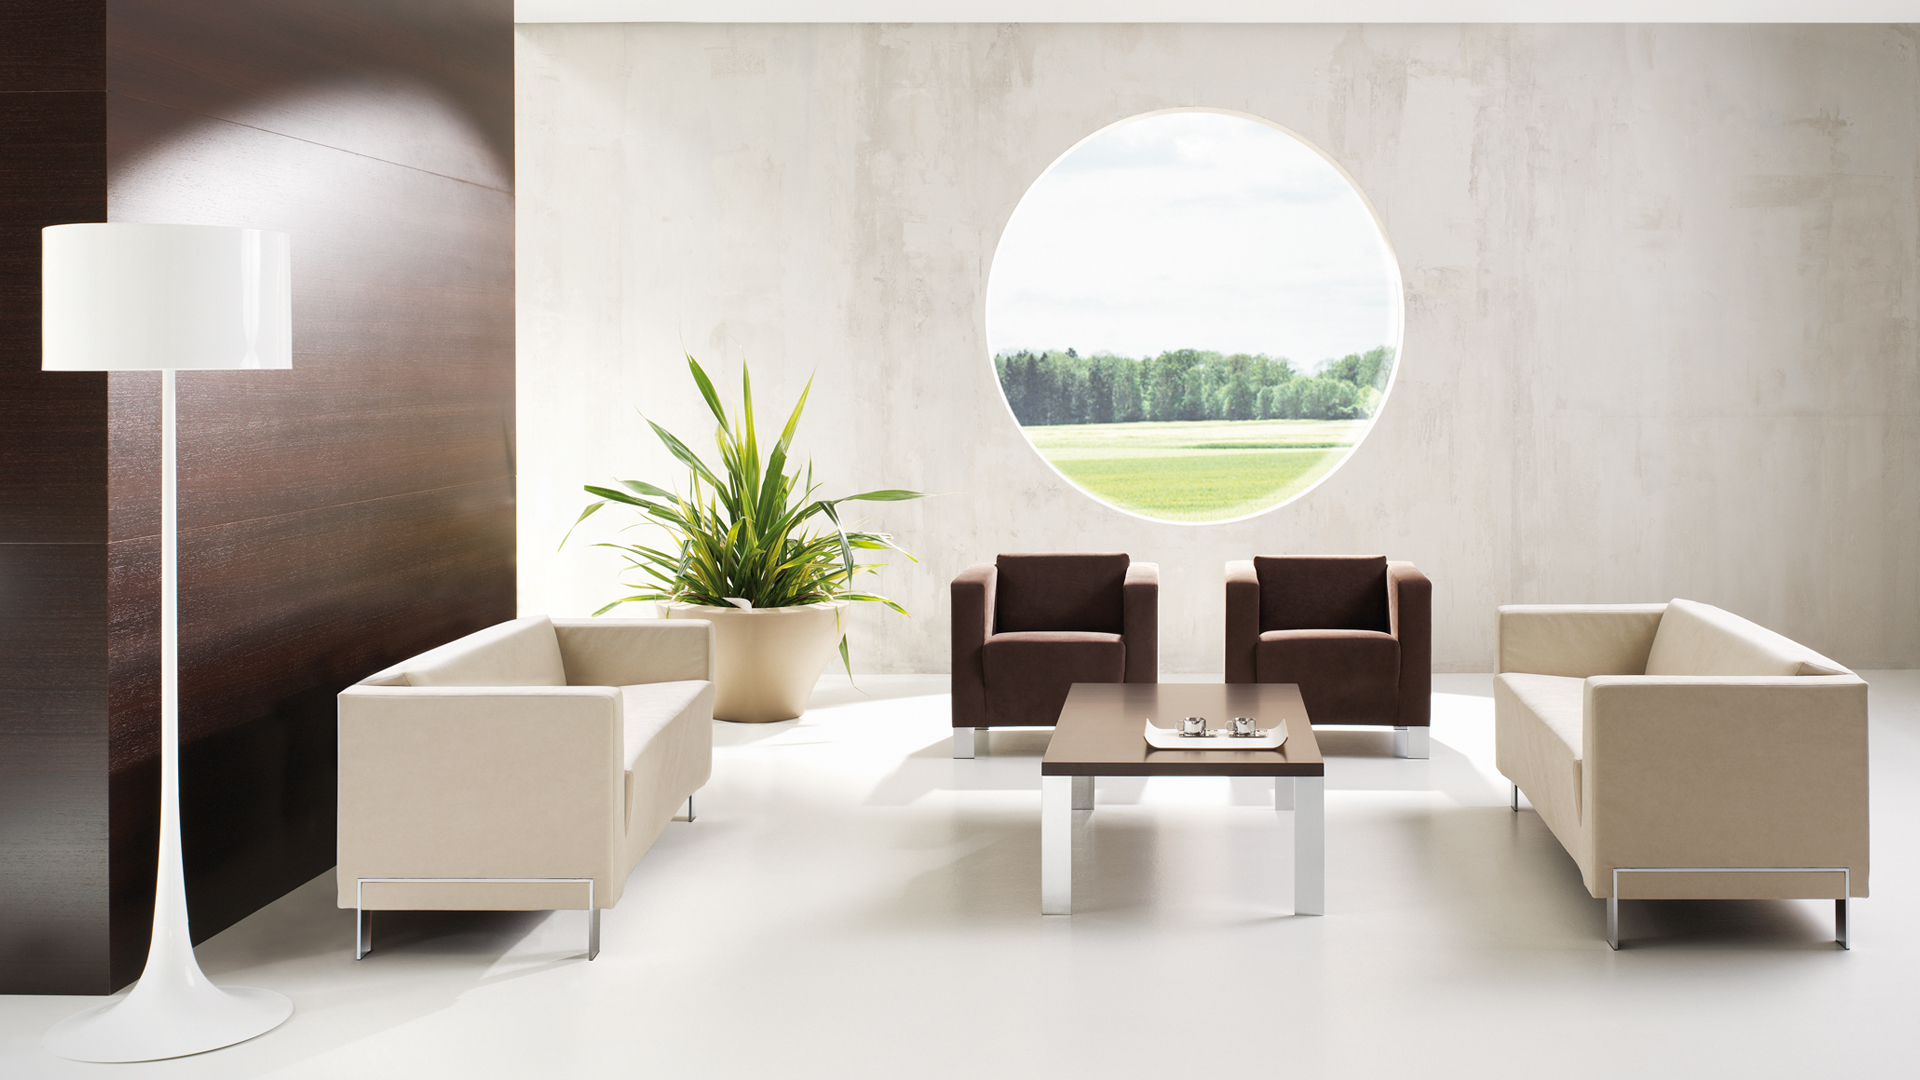 Loungemobel-Milieu-01-studio-mauser-16-9oclvCOSb7DzxS